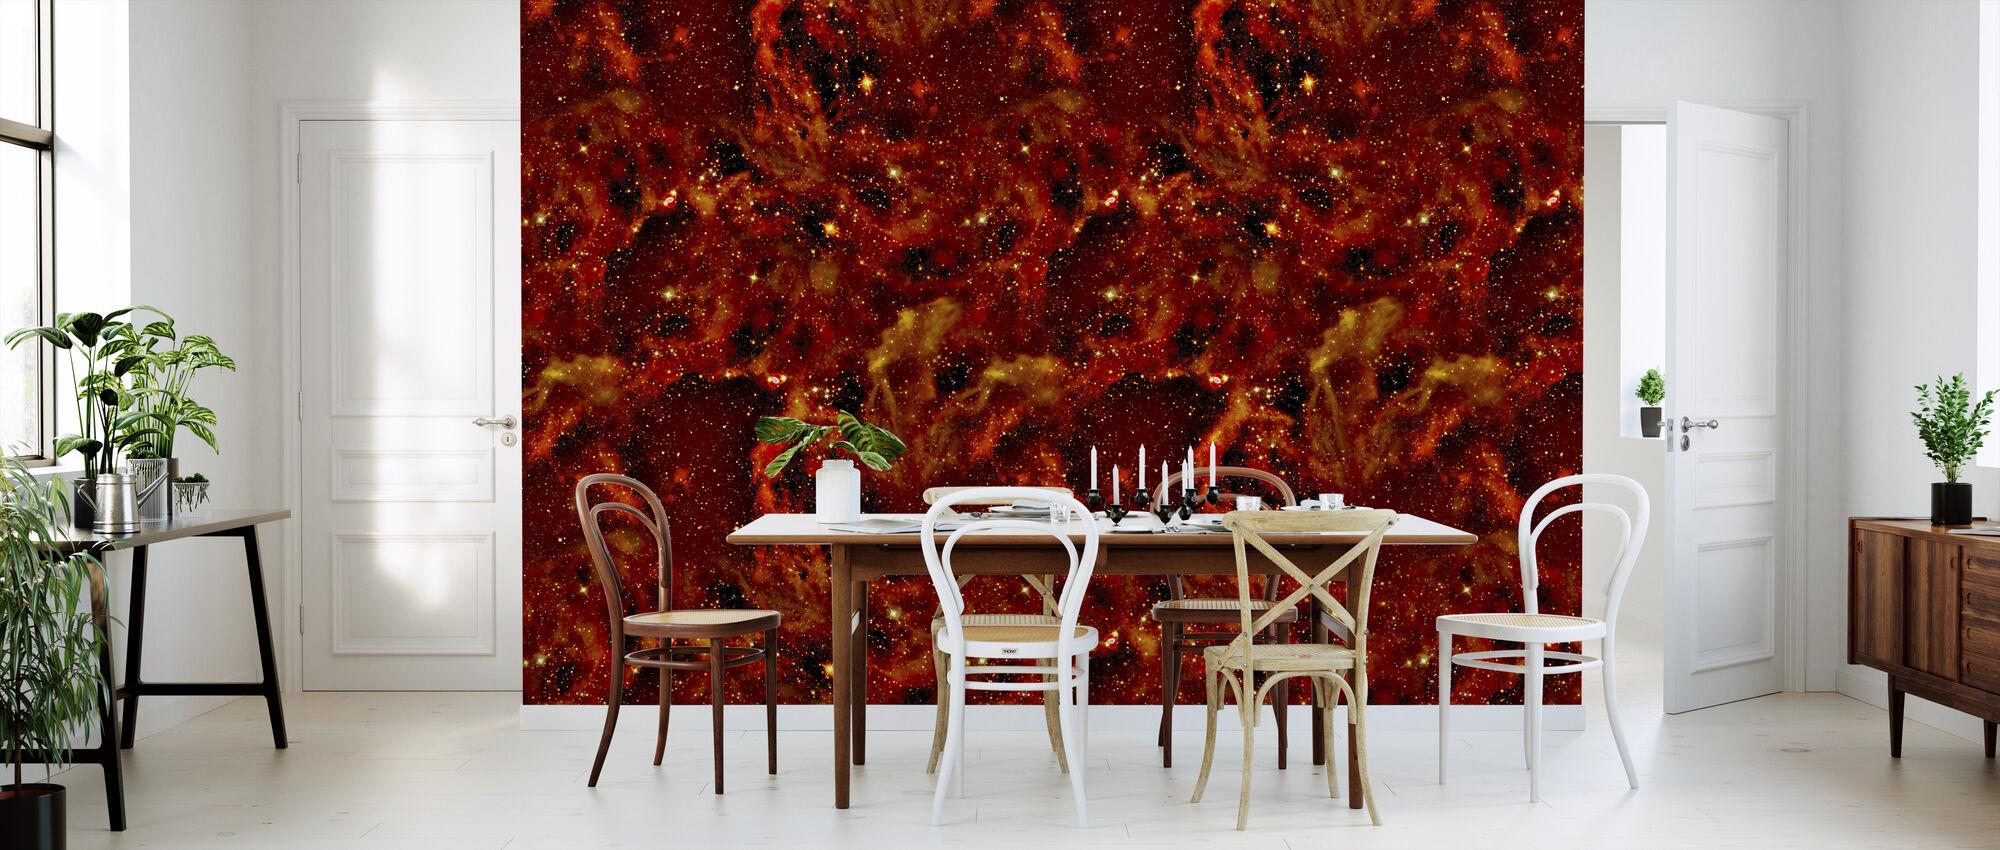 Fire Land - Wallpaper - Kitchen